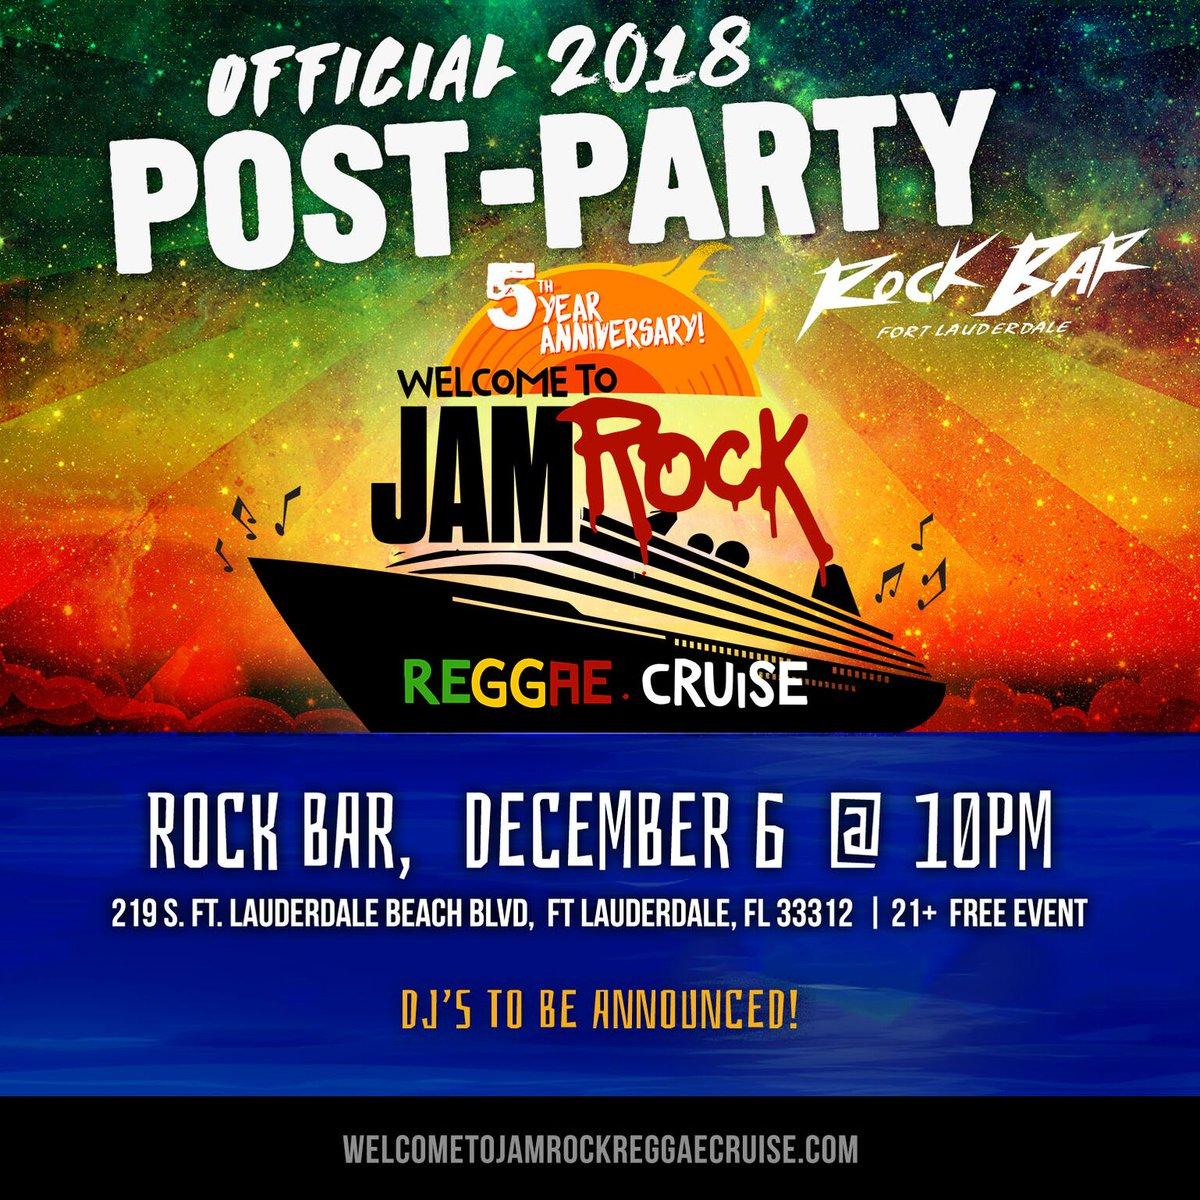 Jamrock Cruise 2020.Jamrock Reggae Cruise Auf Twitter Official Post Party